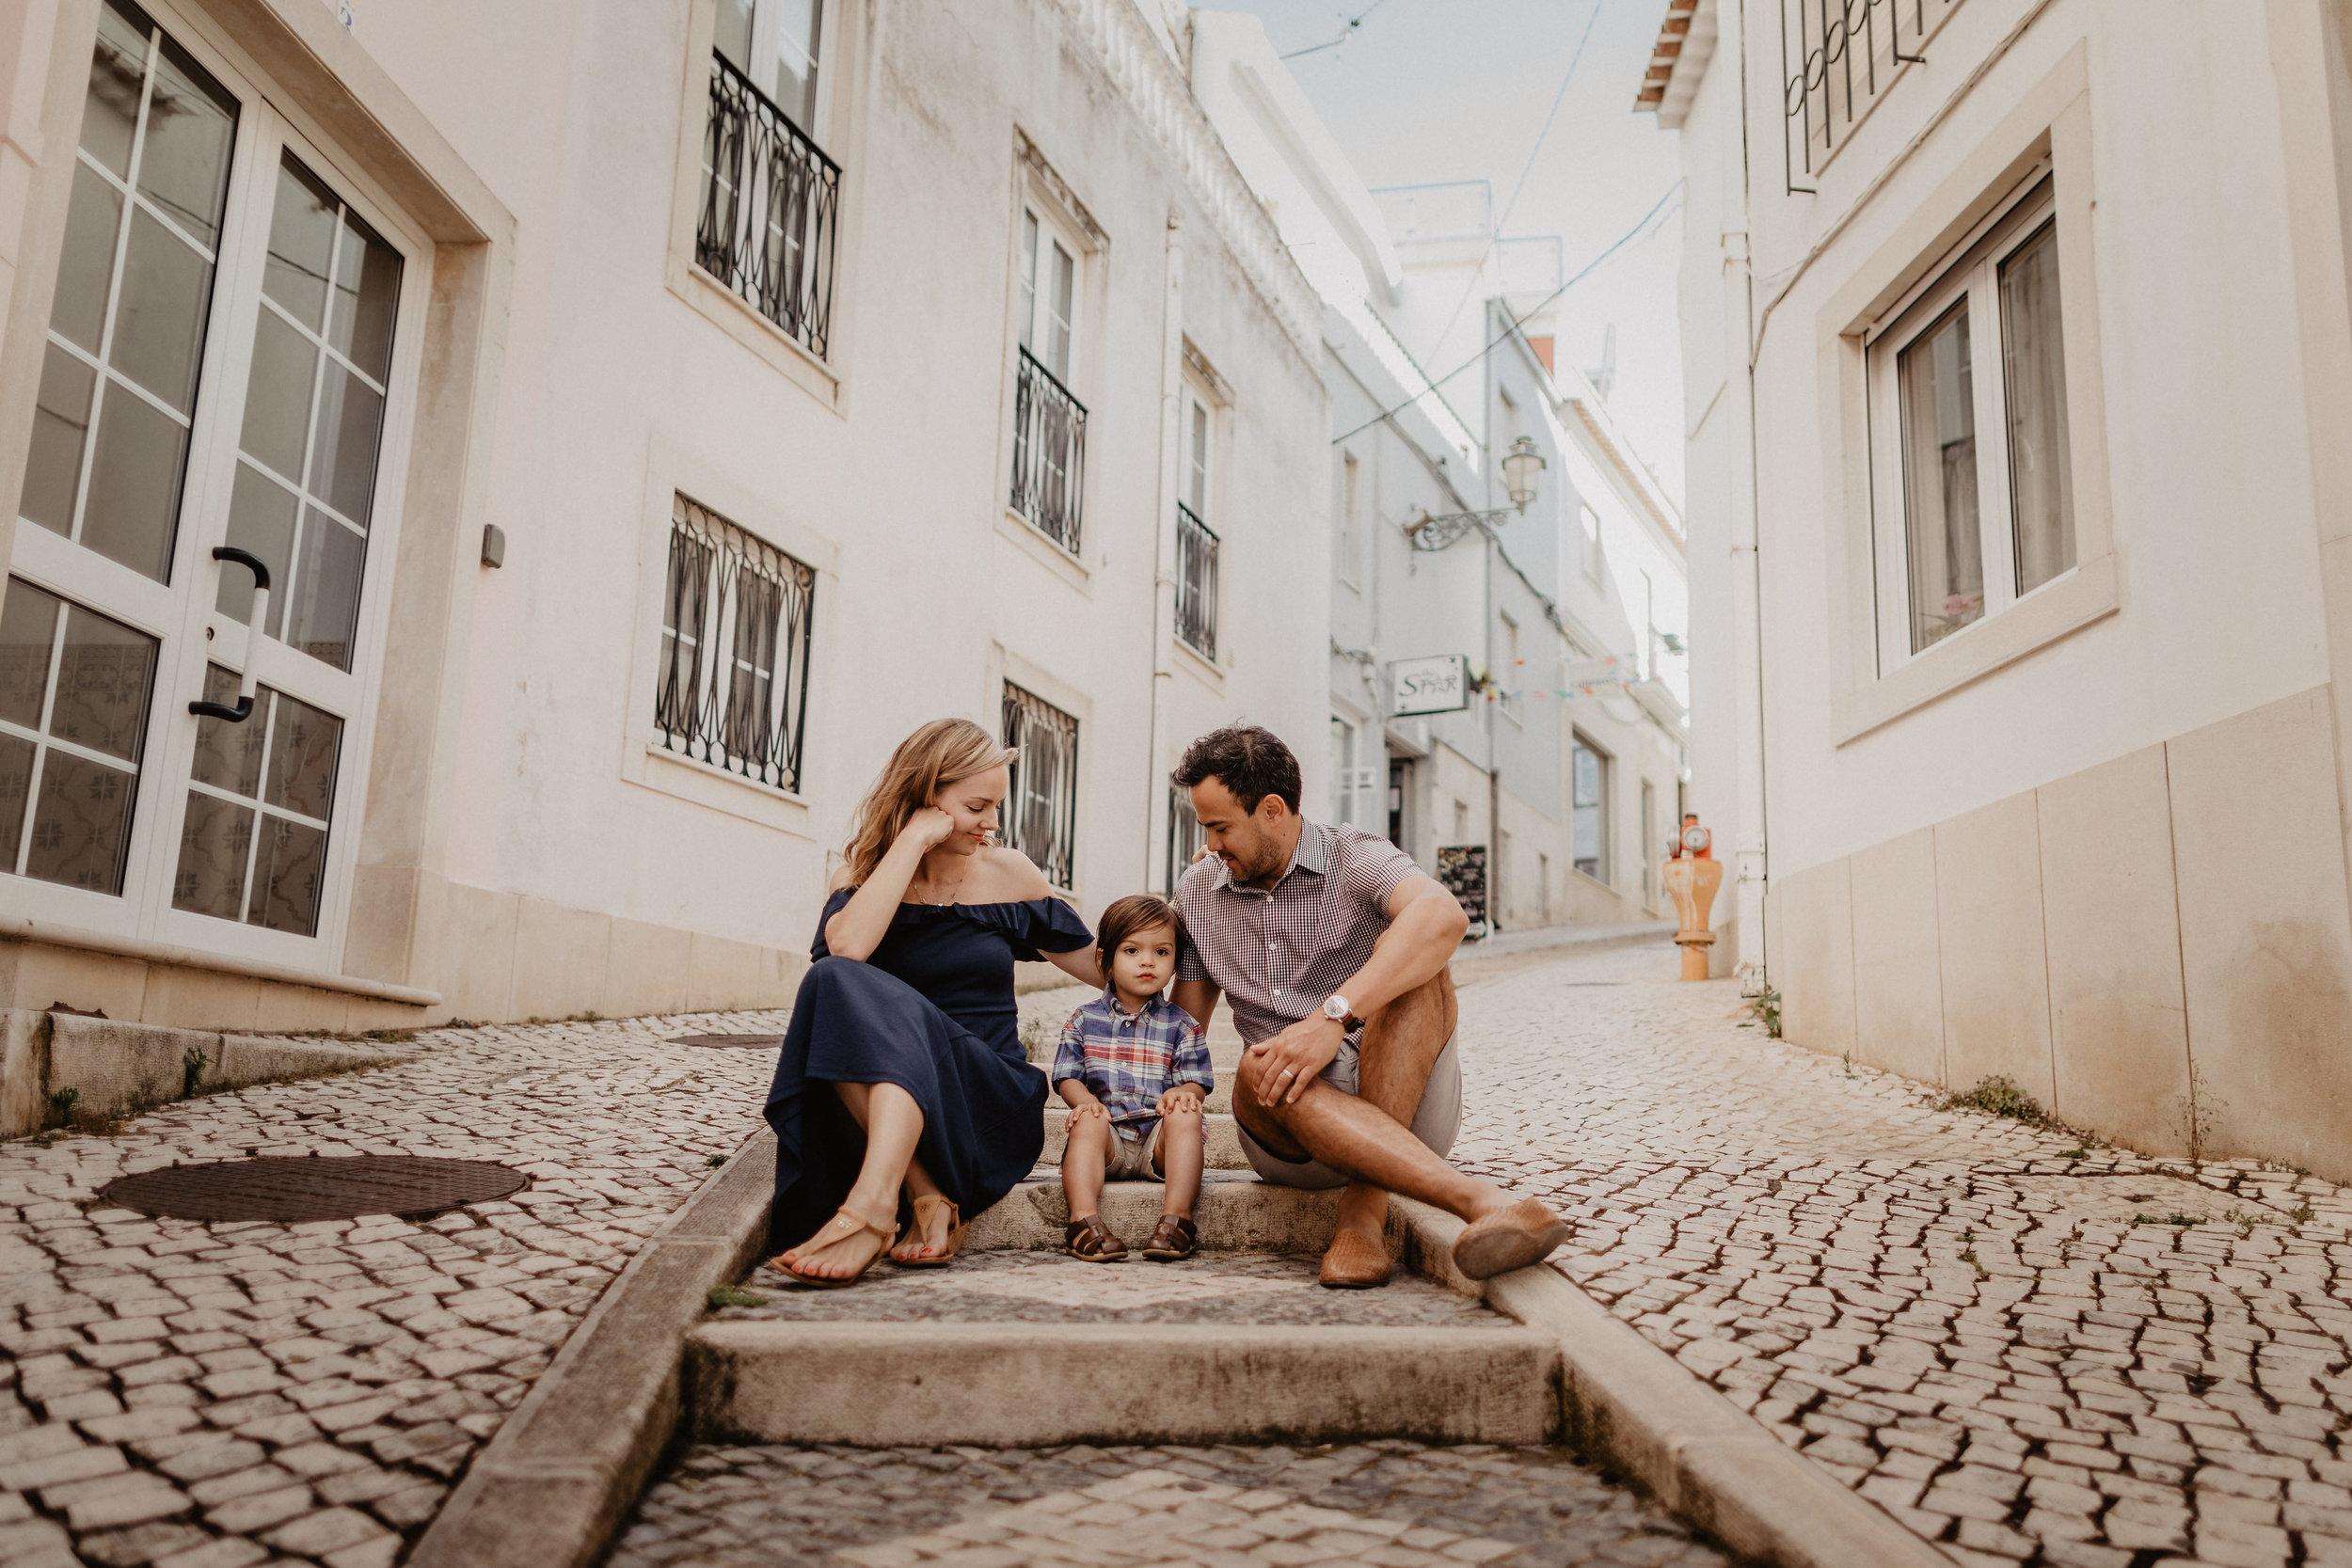 Lapela-Family-photography-Lagos-Algarve7.jpg